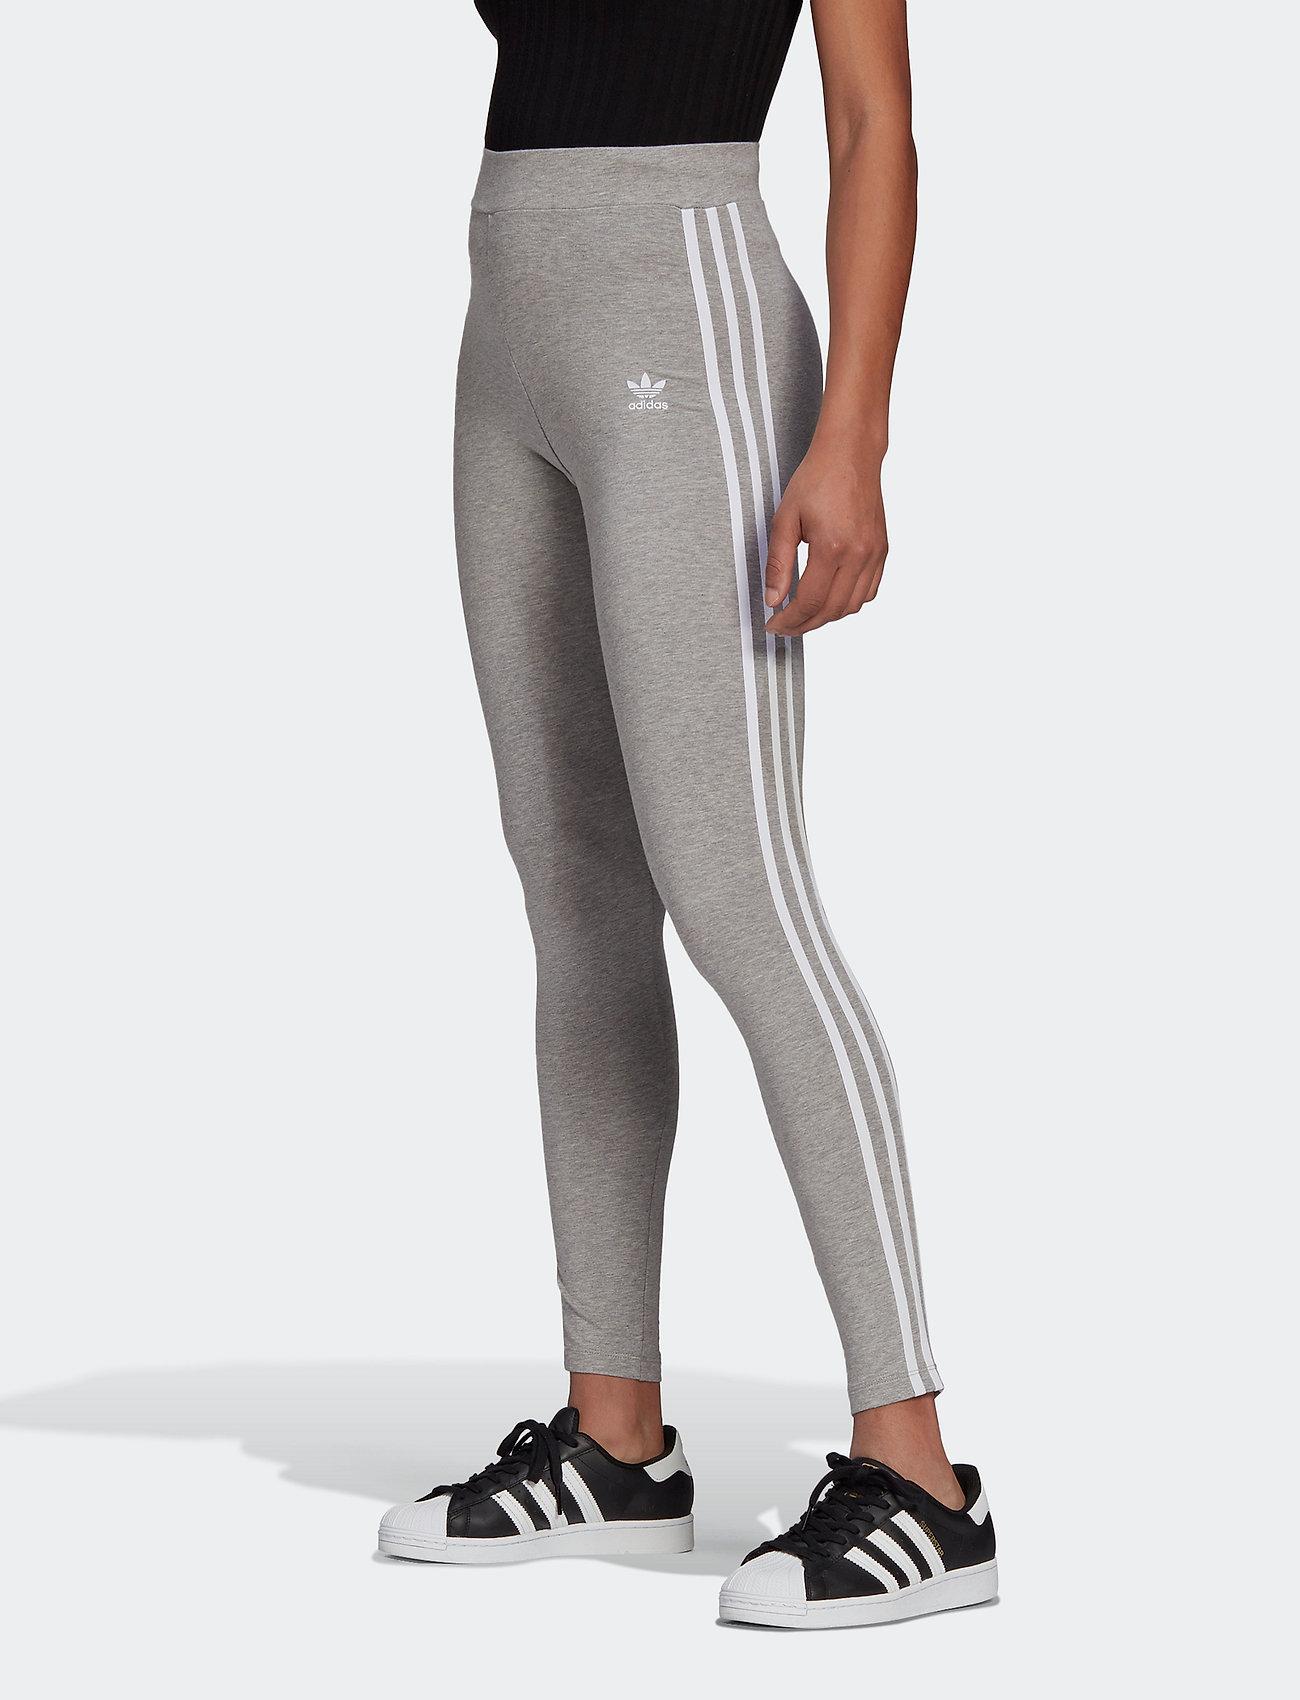 adidas Originals - Adicolor Classics 3-Stripes Tights W - tights & shorts - mgreyh - 0